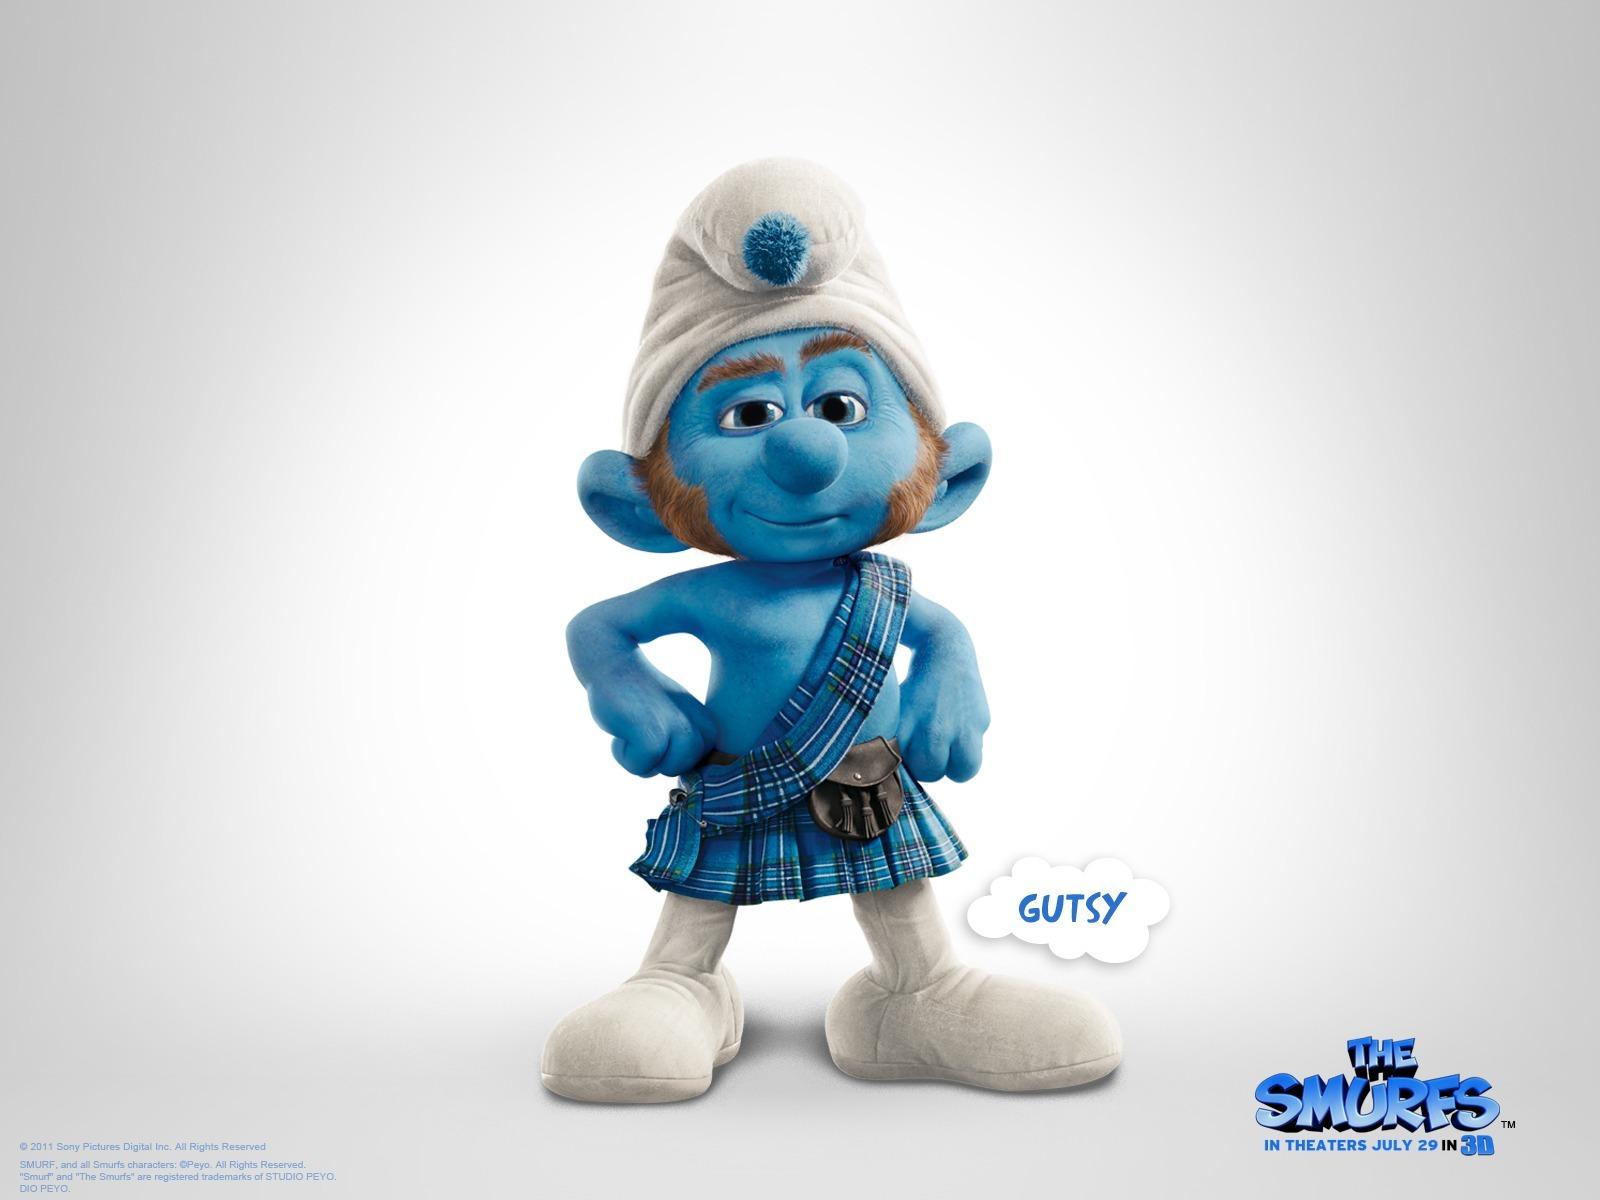 Smurf Gutsy Wallpaper